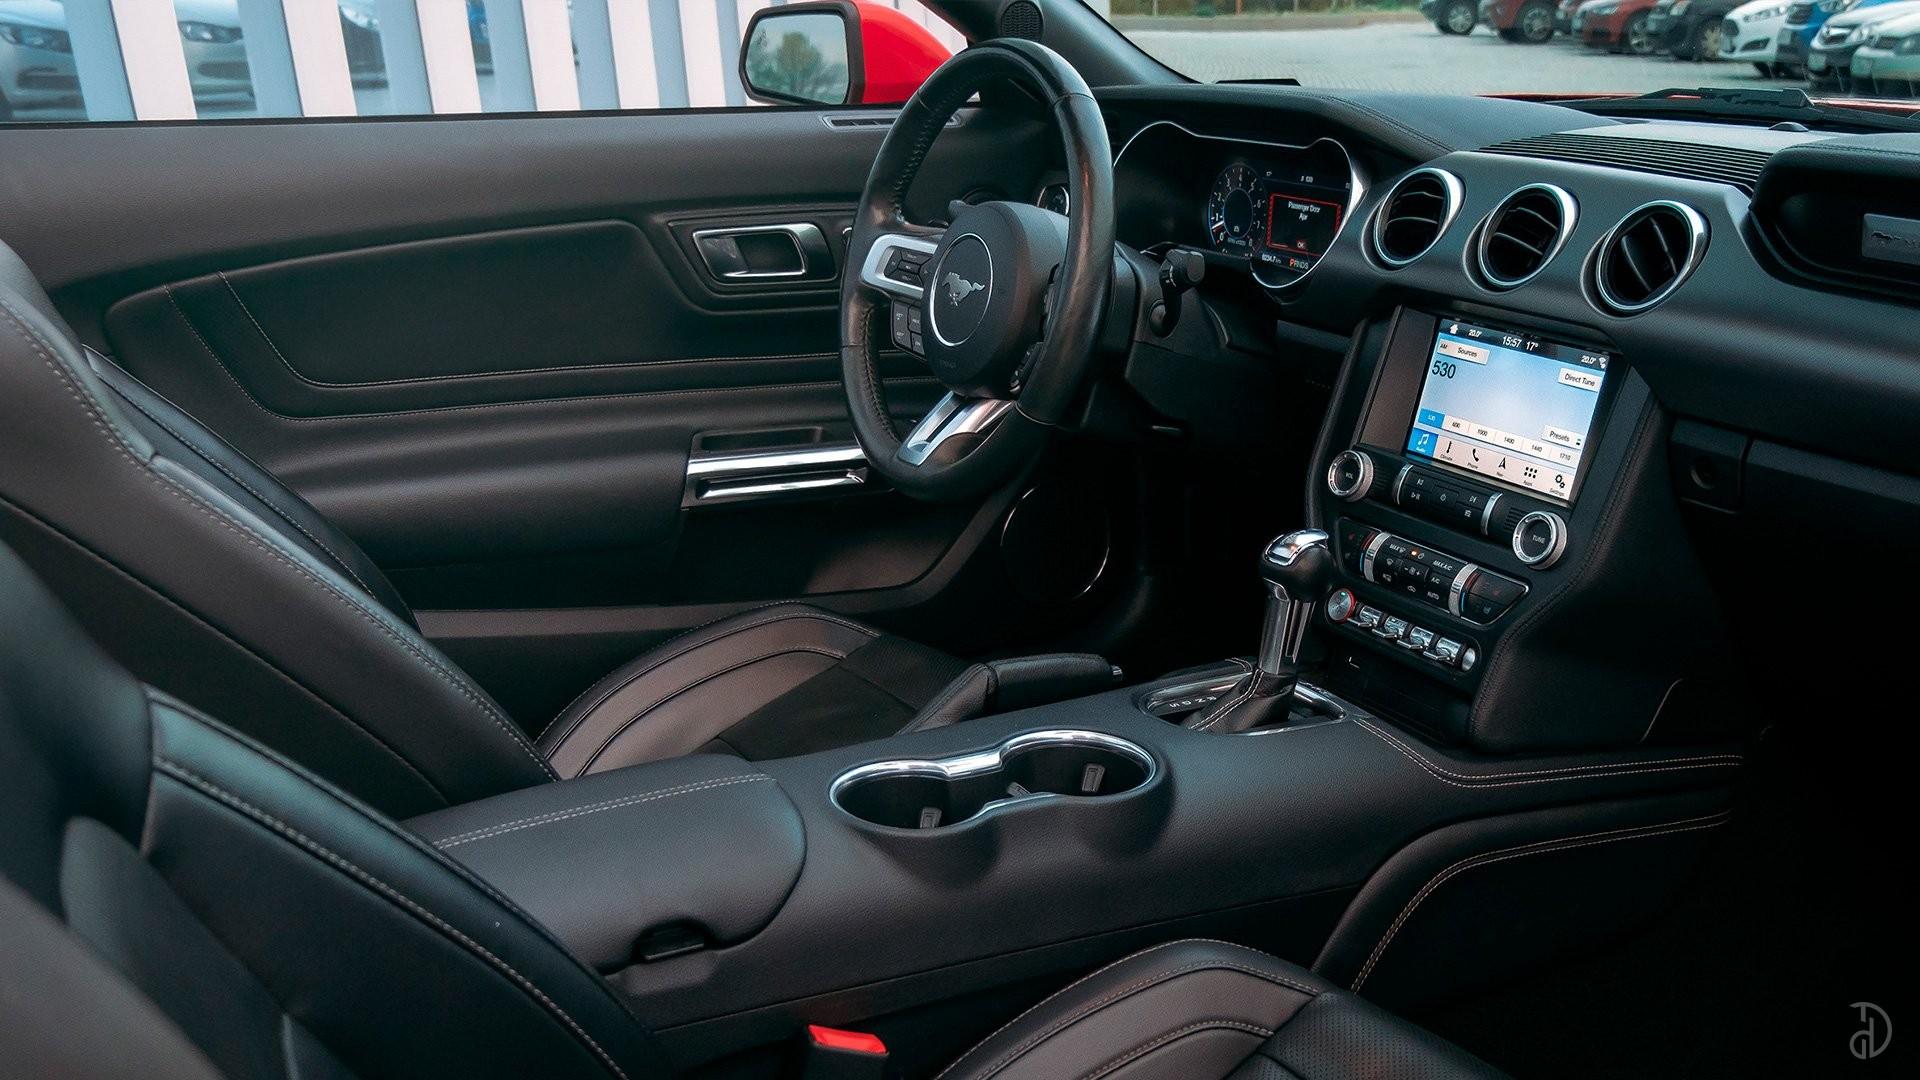 Аренда Ford Mustang GT 5.0  в Москве. Фото 14